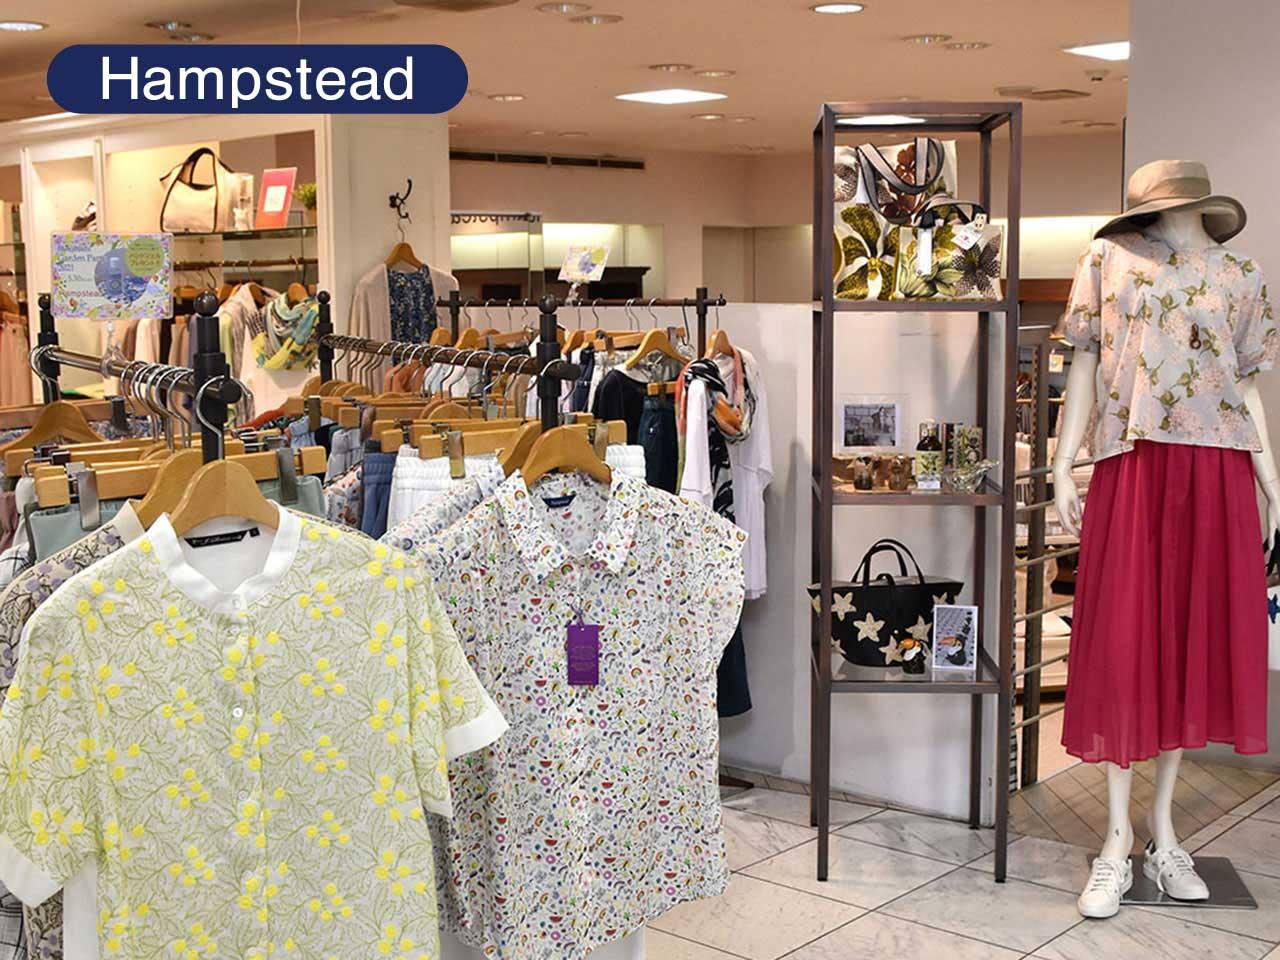 Hampstead - Mayfair hampstead 横浜ポルタ店